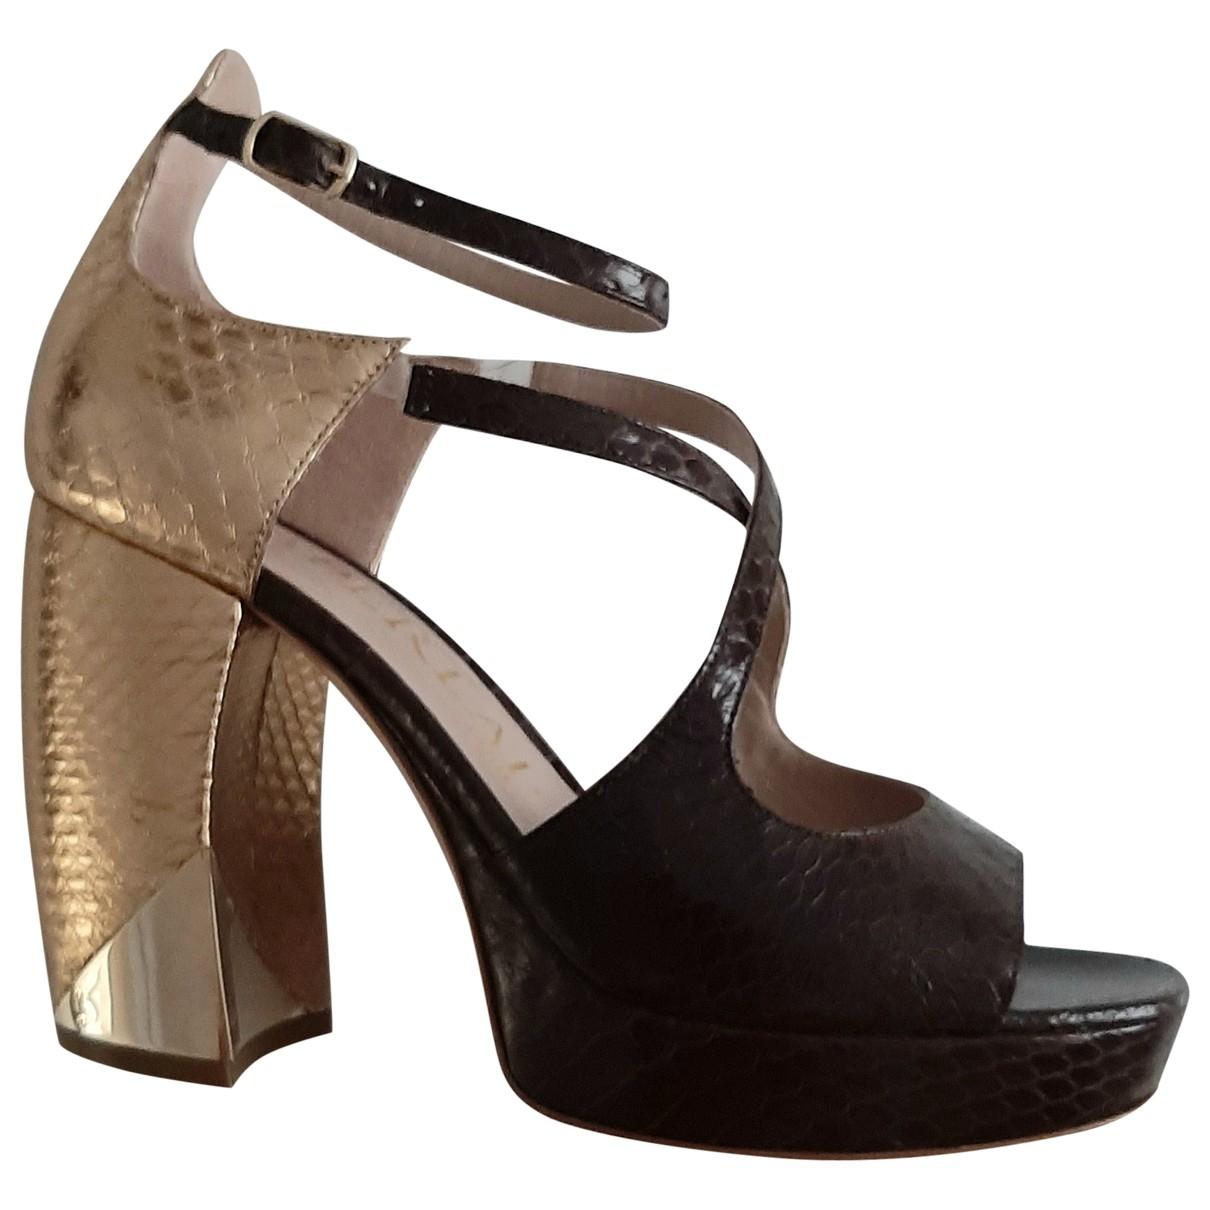 Aperlai \N Brown Leather Sandals for Women 37 EU